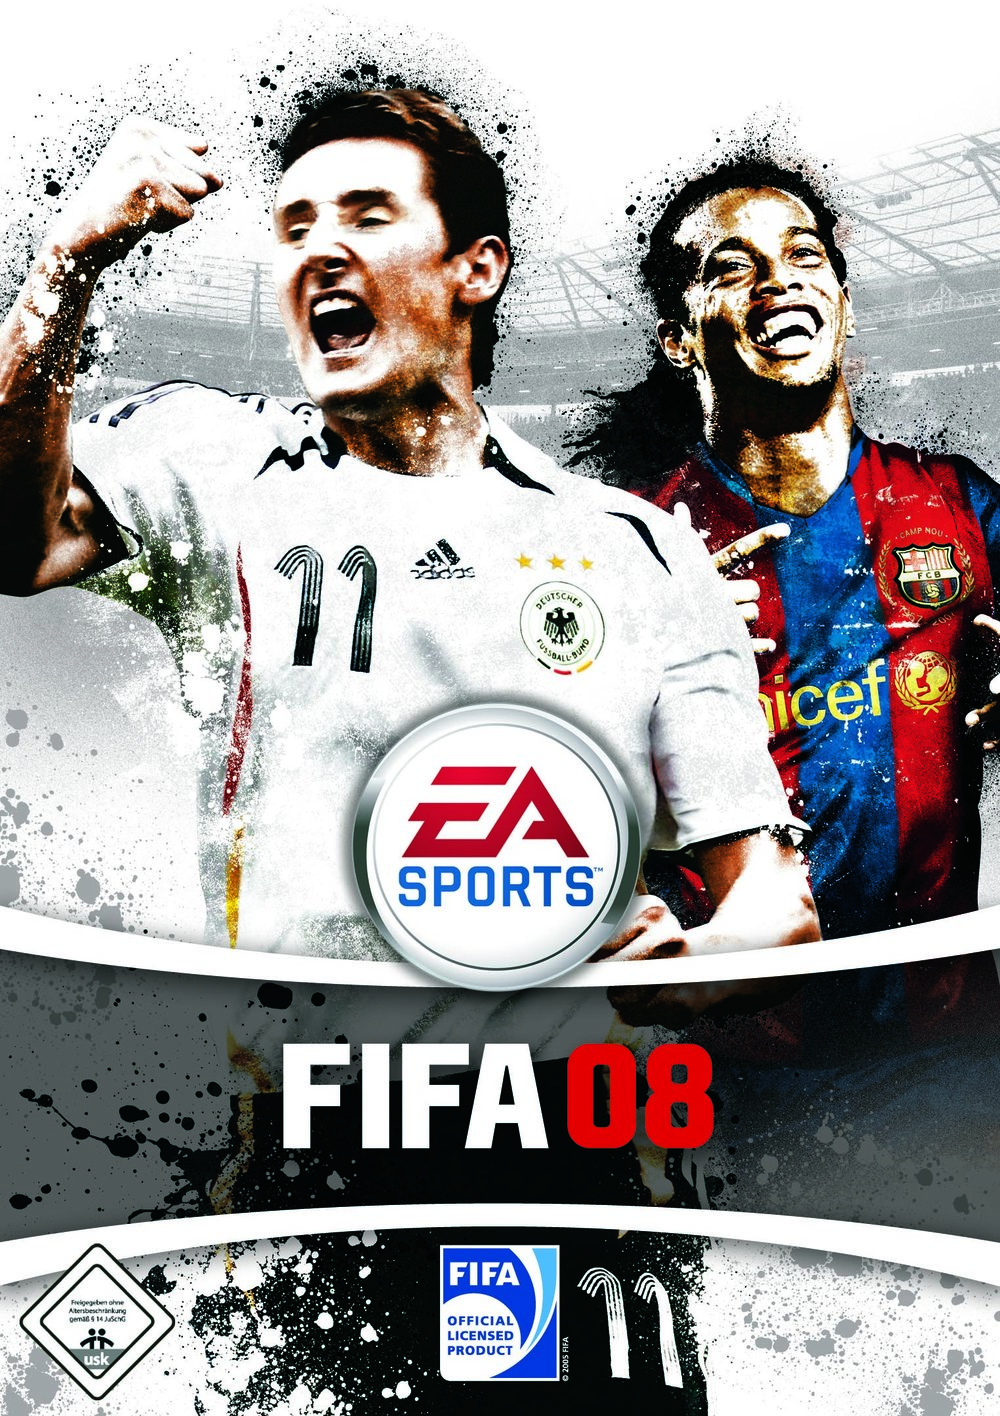 FIFA08genPFTger.jpg